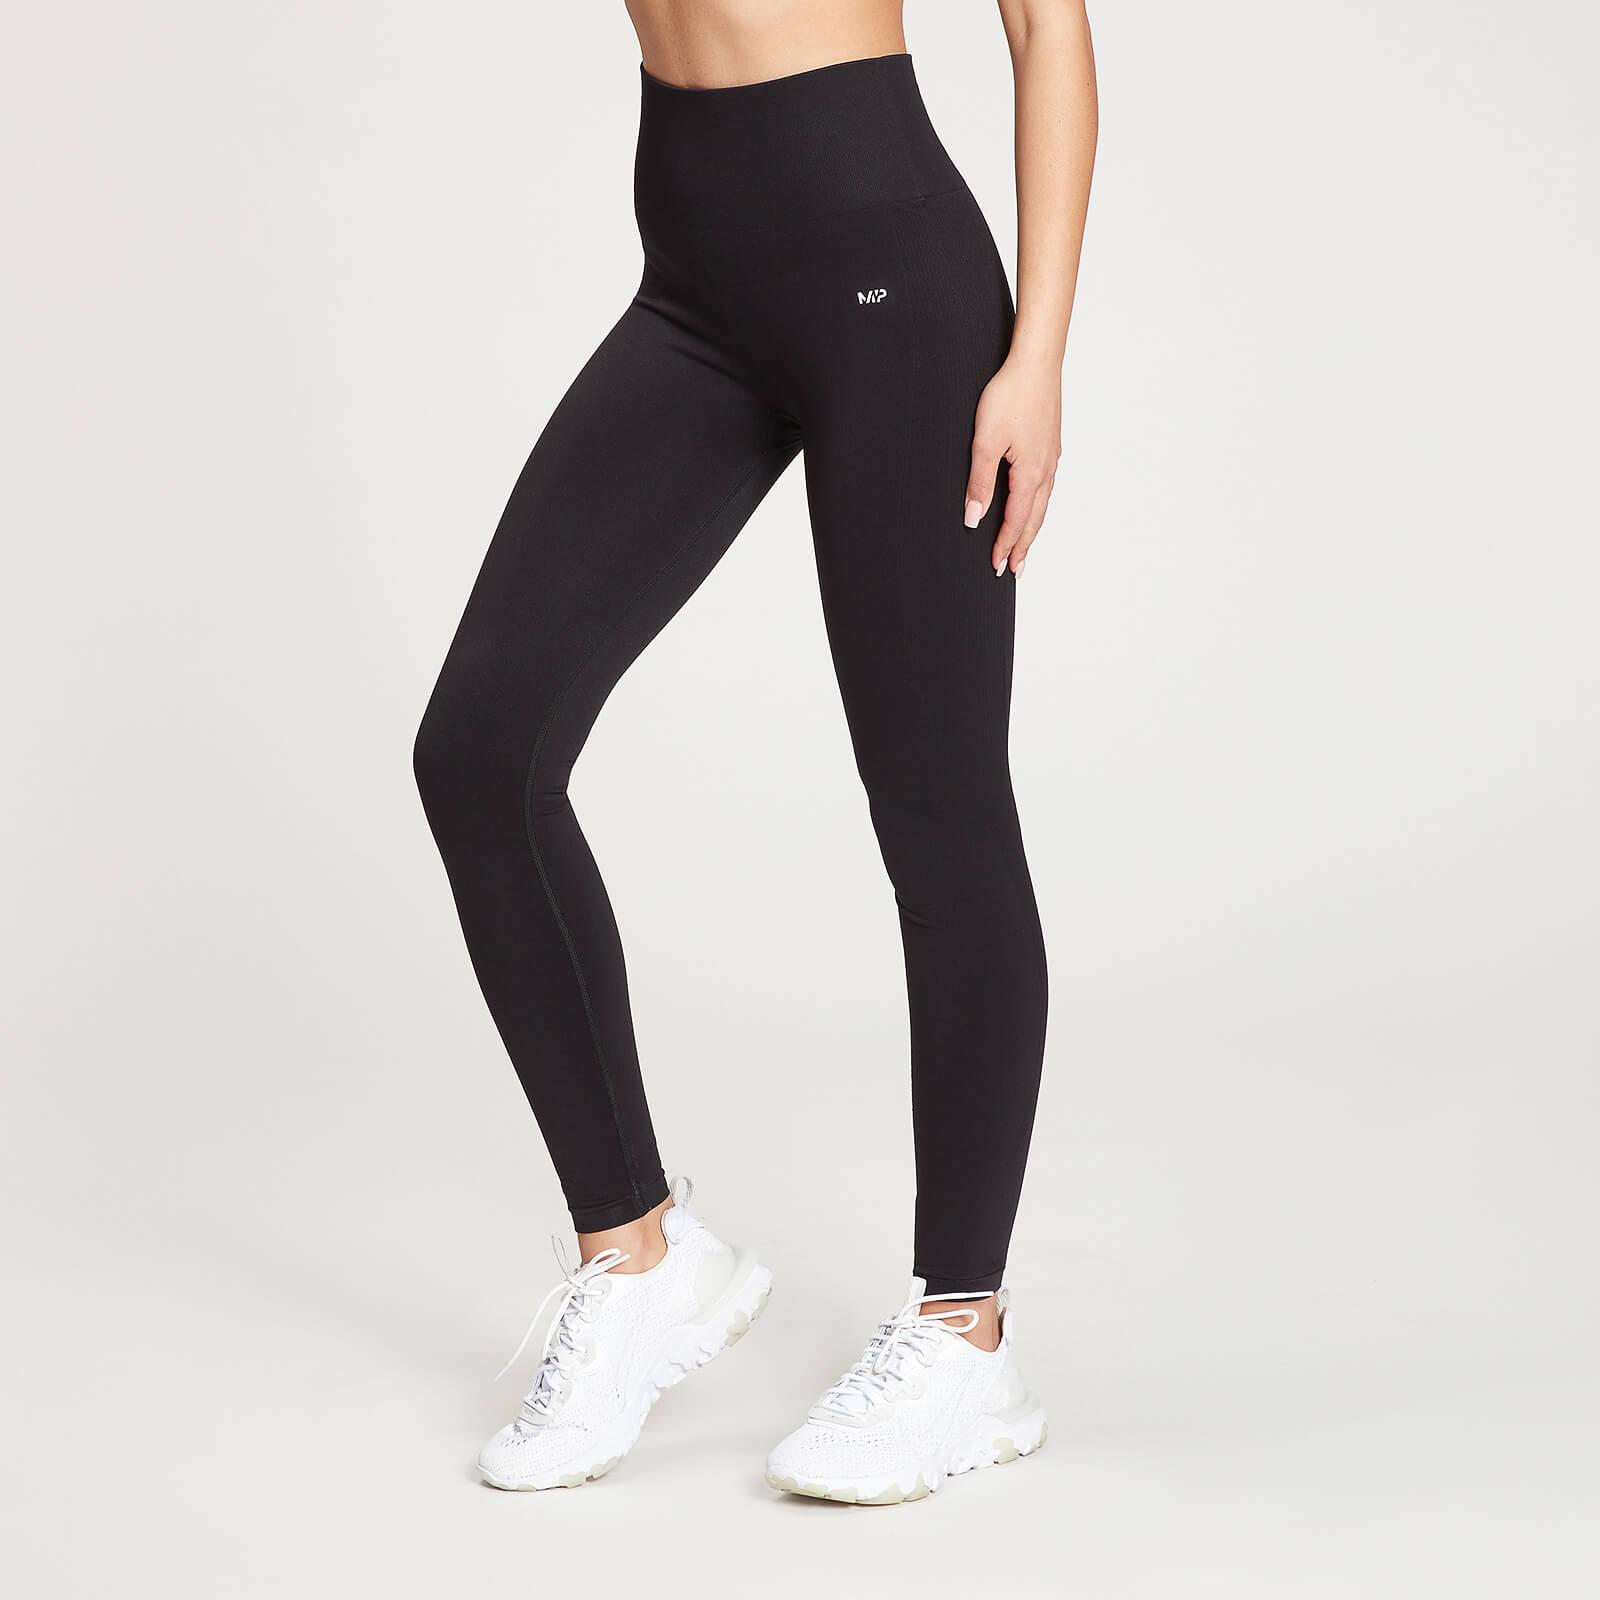 Купить MP Women's Shape Seamless Ultra Leggings - Black - XXL, Myprotein International